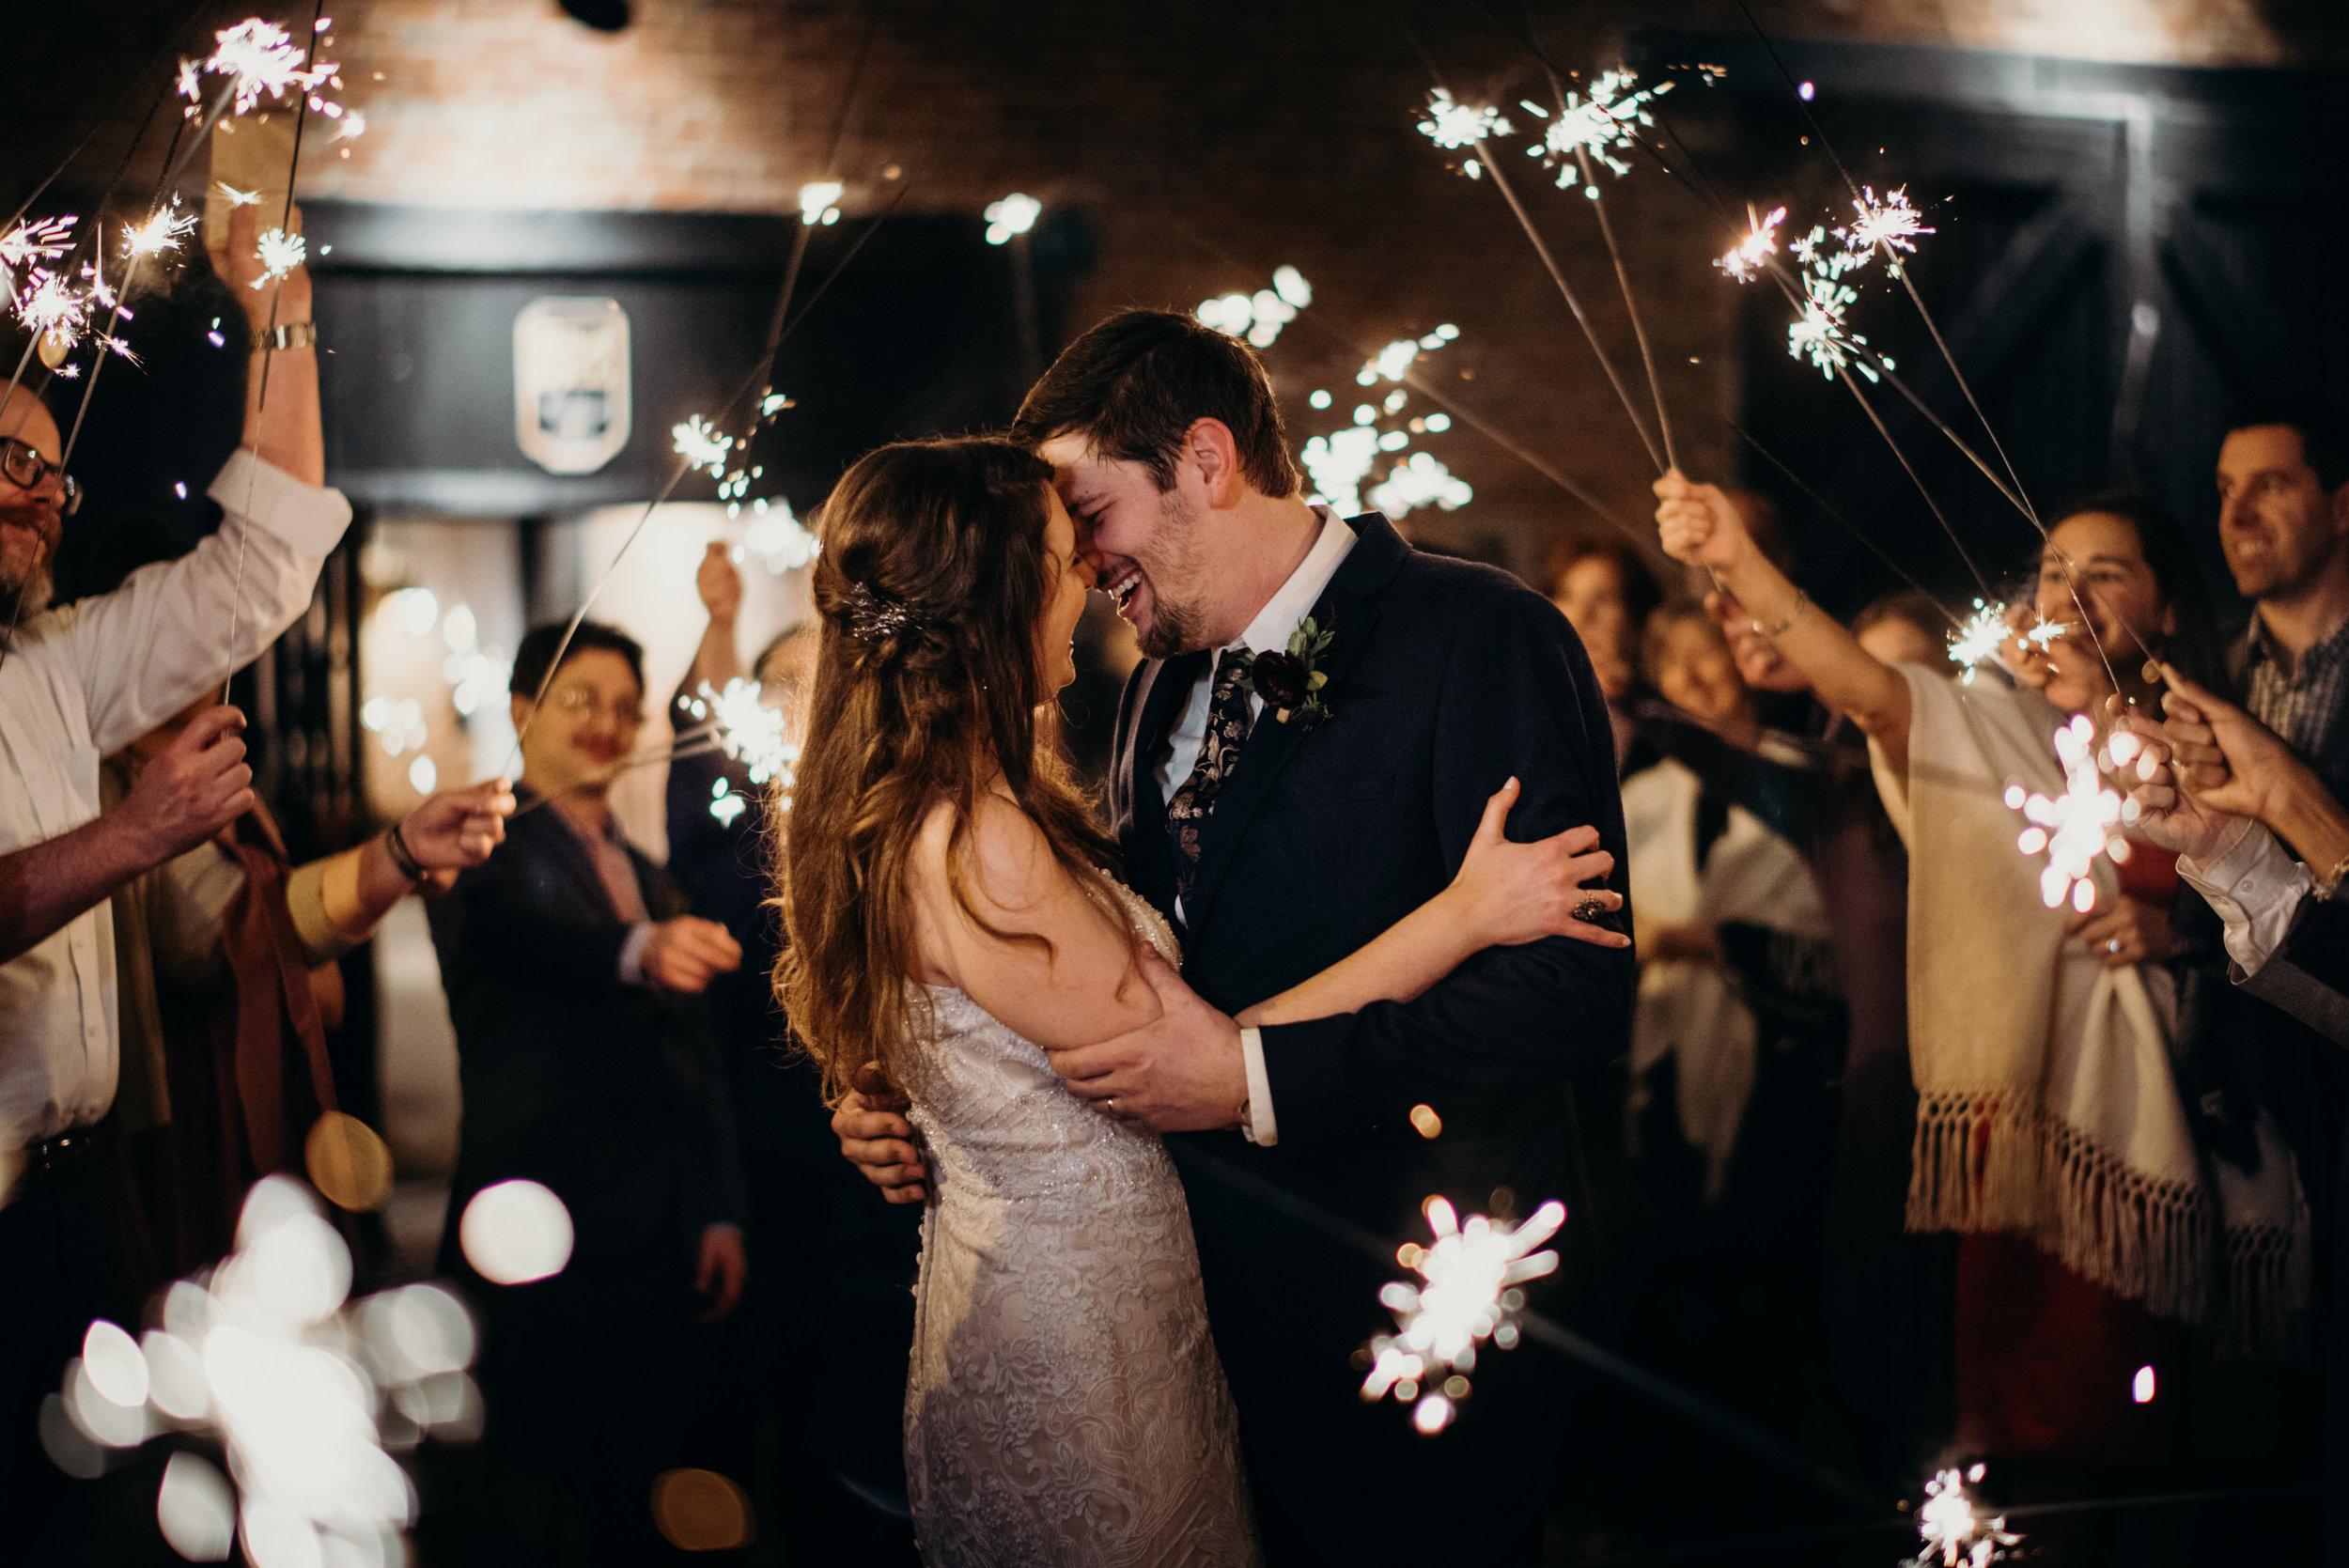 lindsey-paradiso-photography-elise-travis-wedding-at-silk-mill-fredericksburg-virginia-4994.jpg